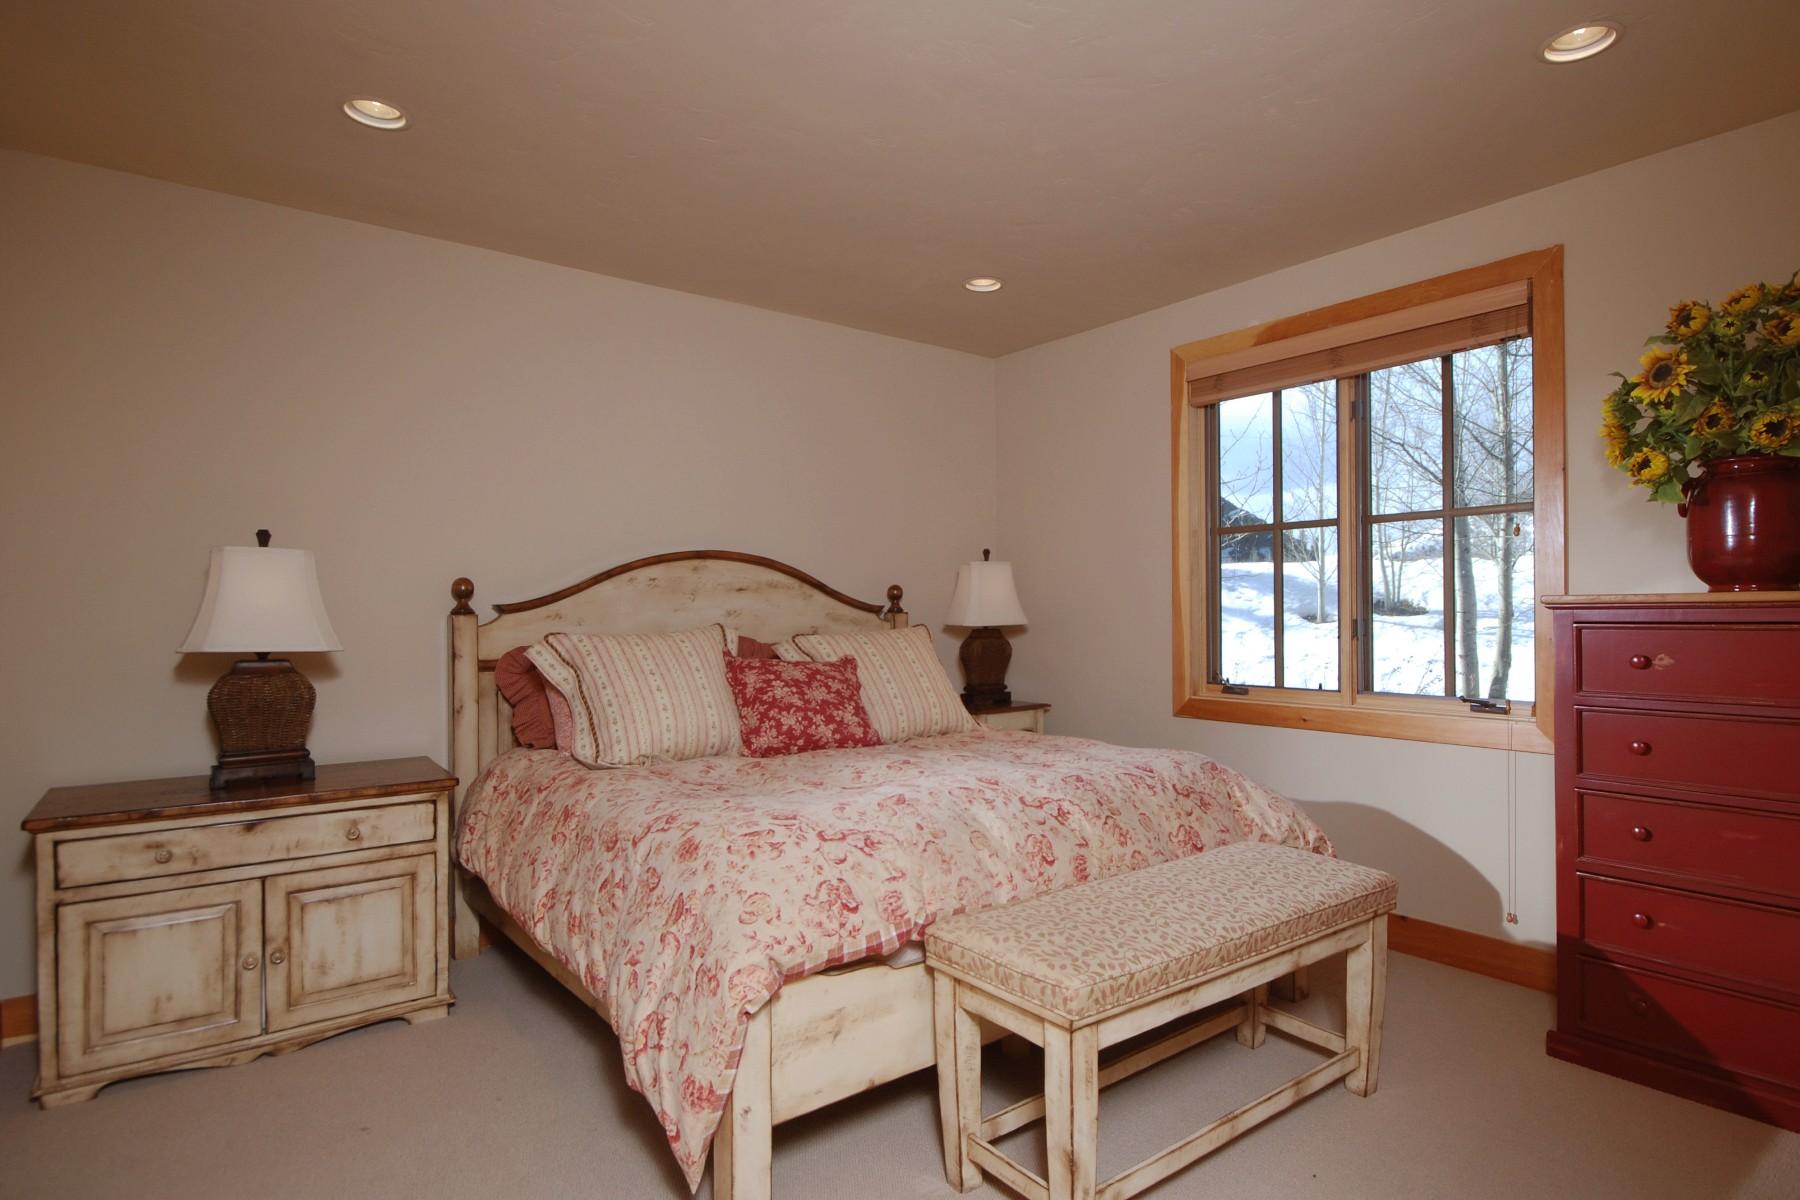 Additional photo for property listing at A Gathering Place 80 River Sage Court Ketchum, Idaho 83340 Estados Unidos